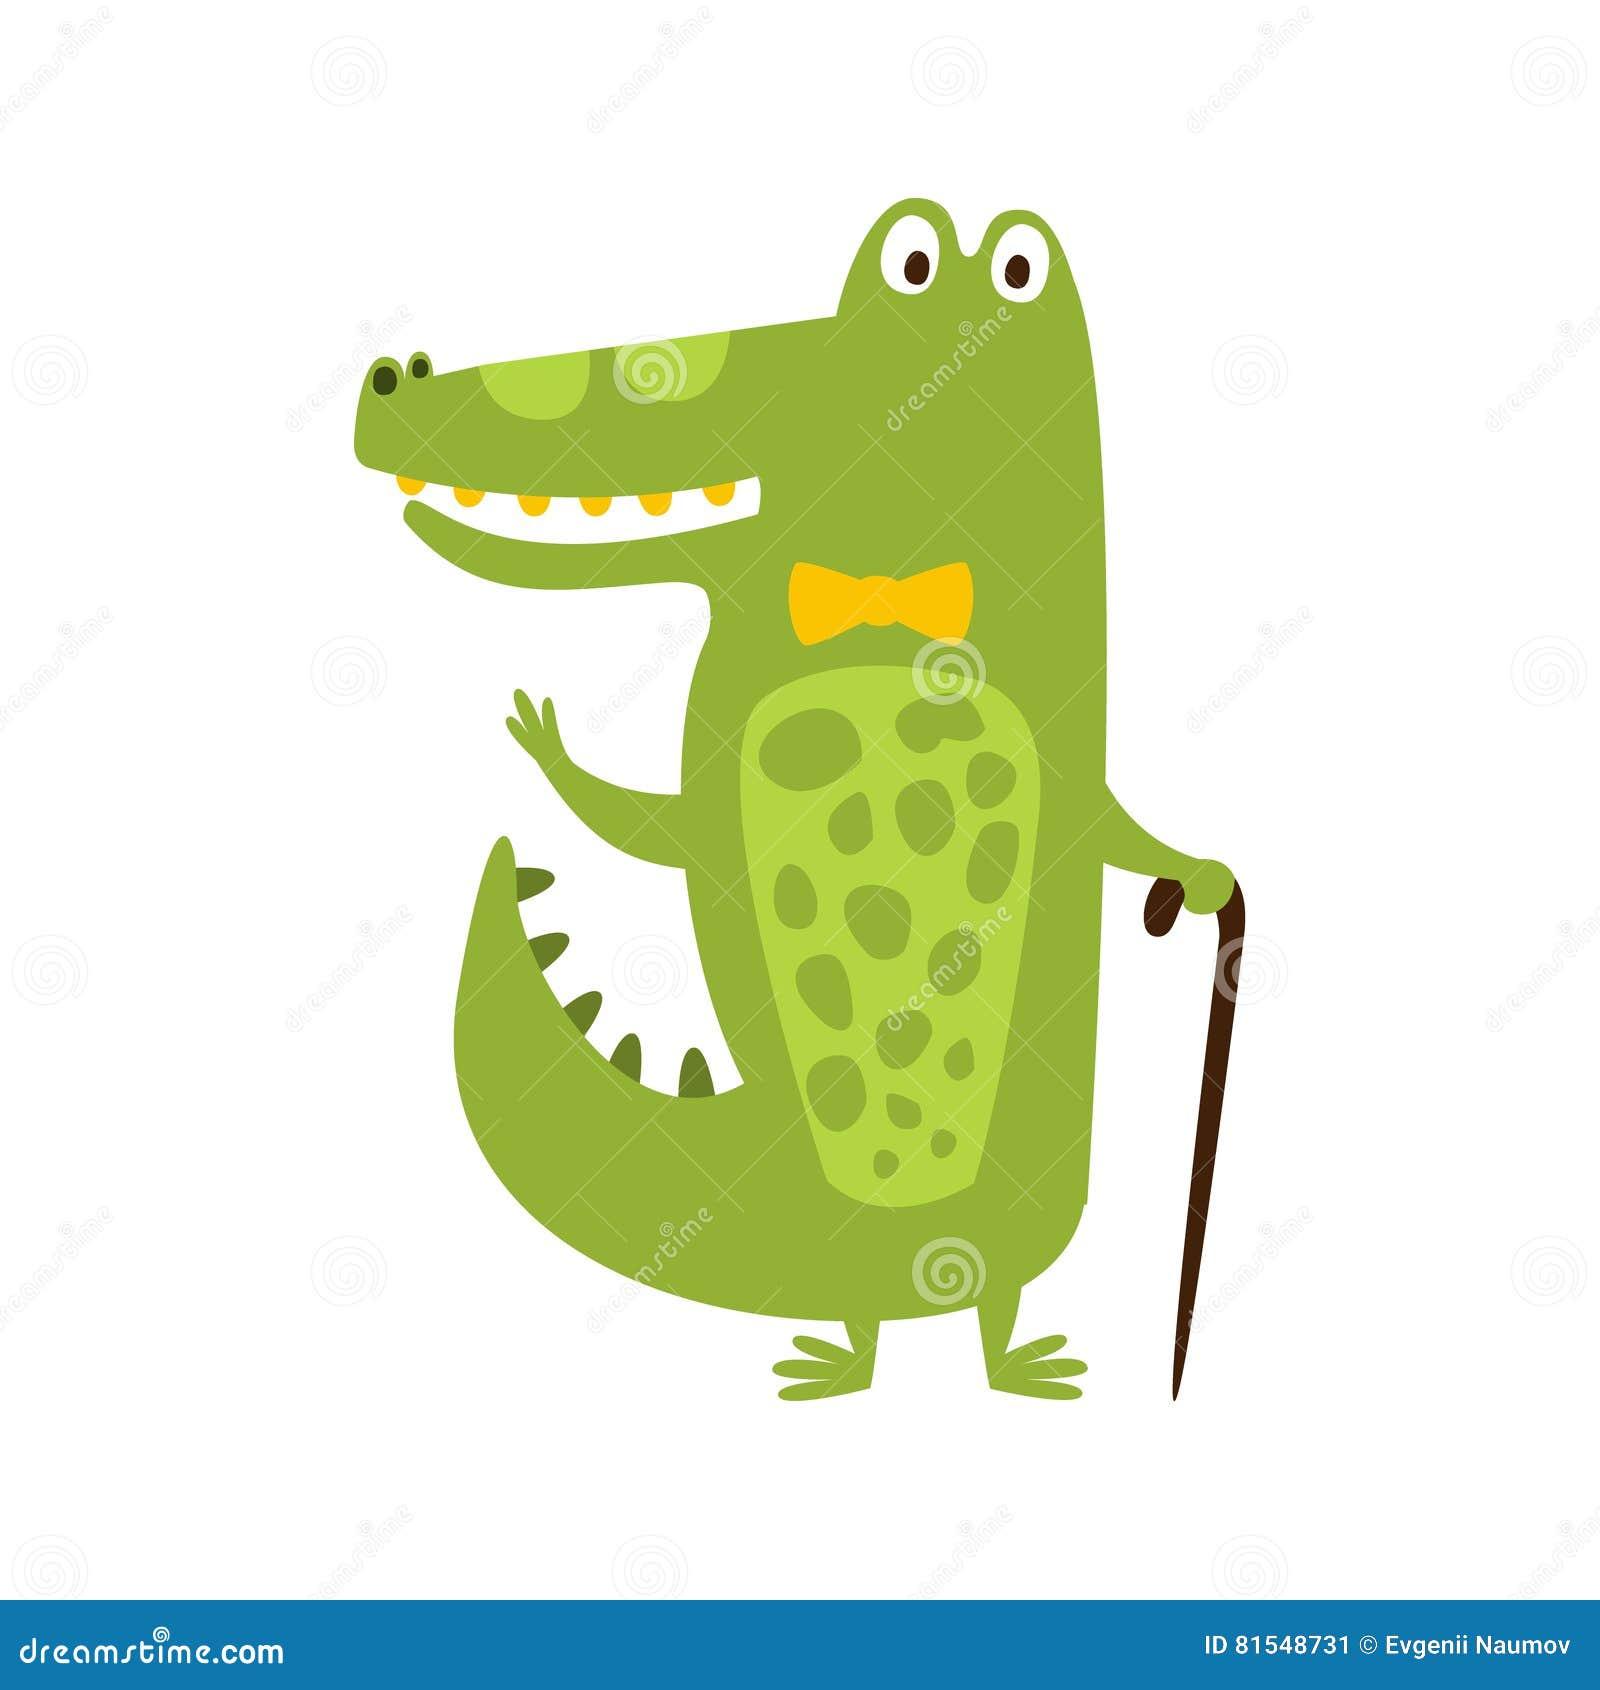 Krokodil met Vlinderdas en Reptiel Dierlijke het Karaktertekening van Cane Flat Cartoon Green Friendly